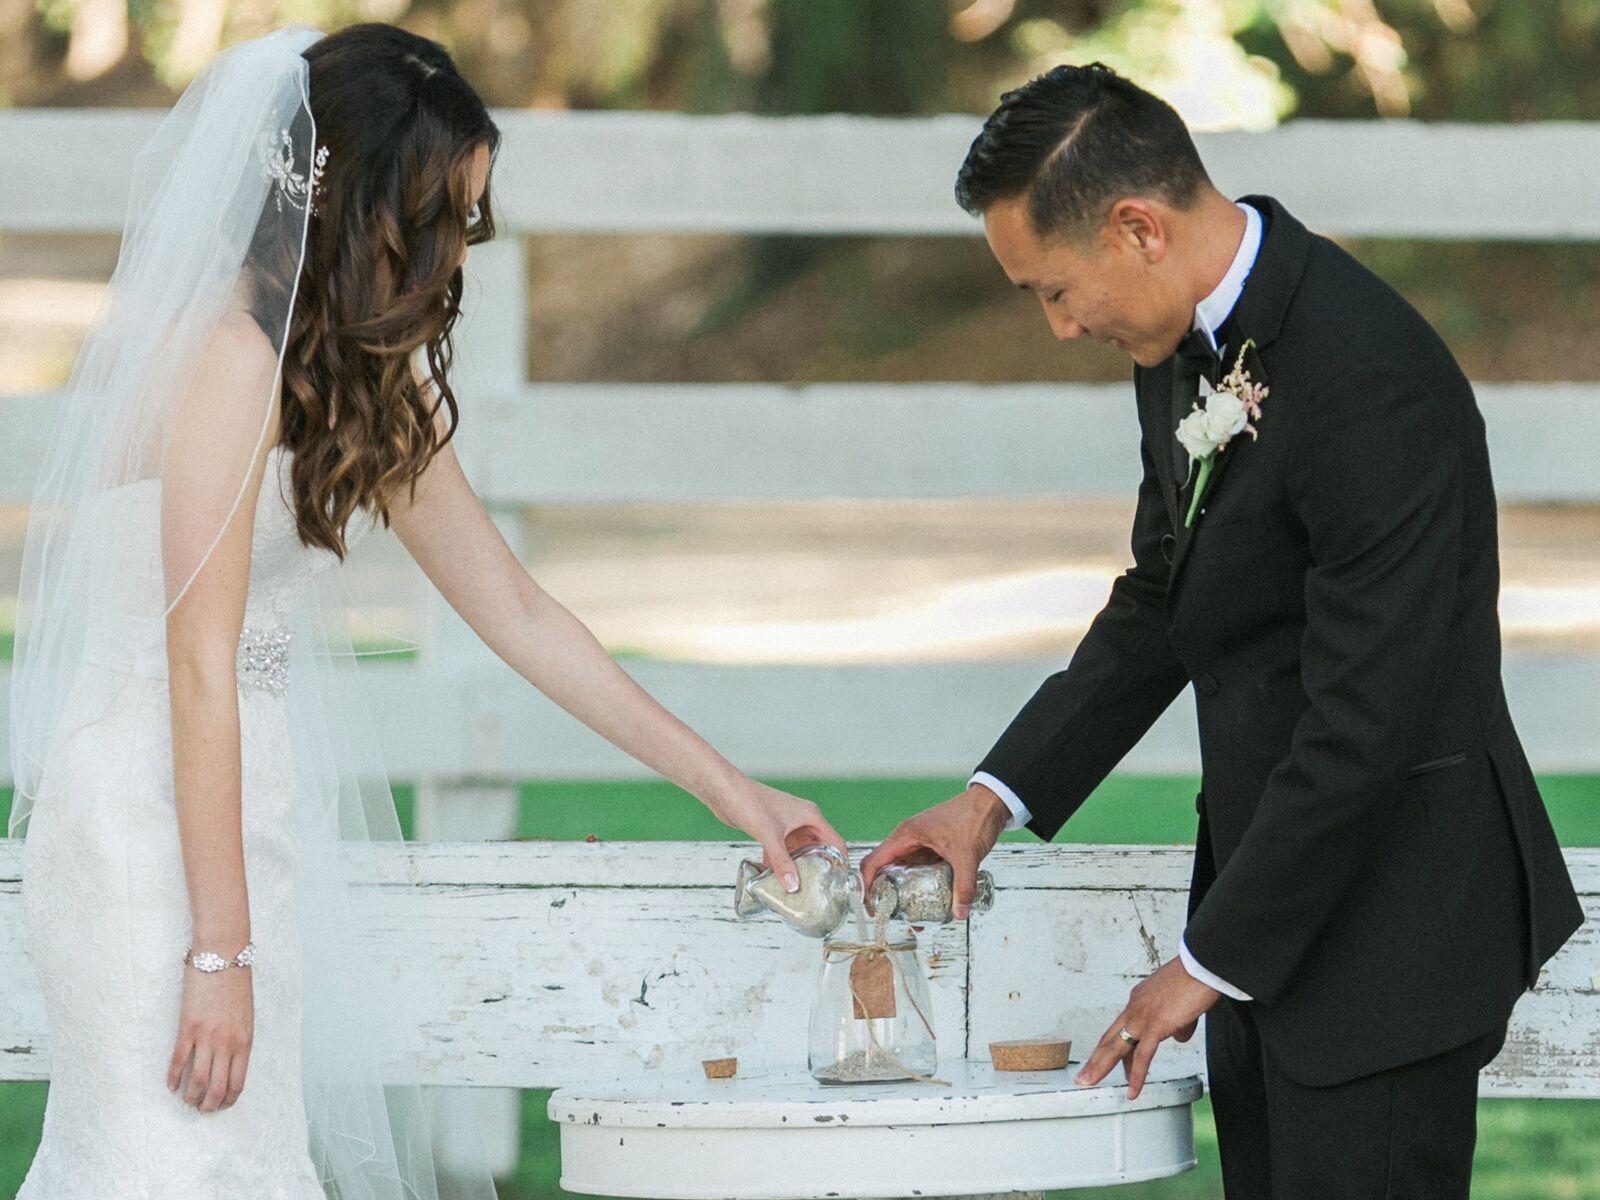 Wedding Ceremony: Alternatives To Unity Candles?